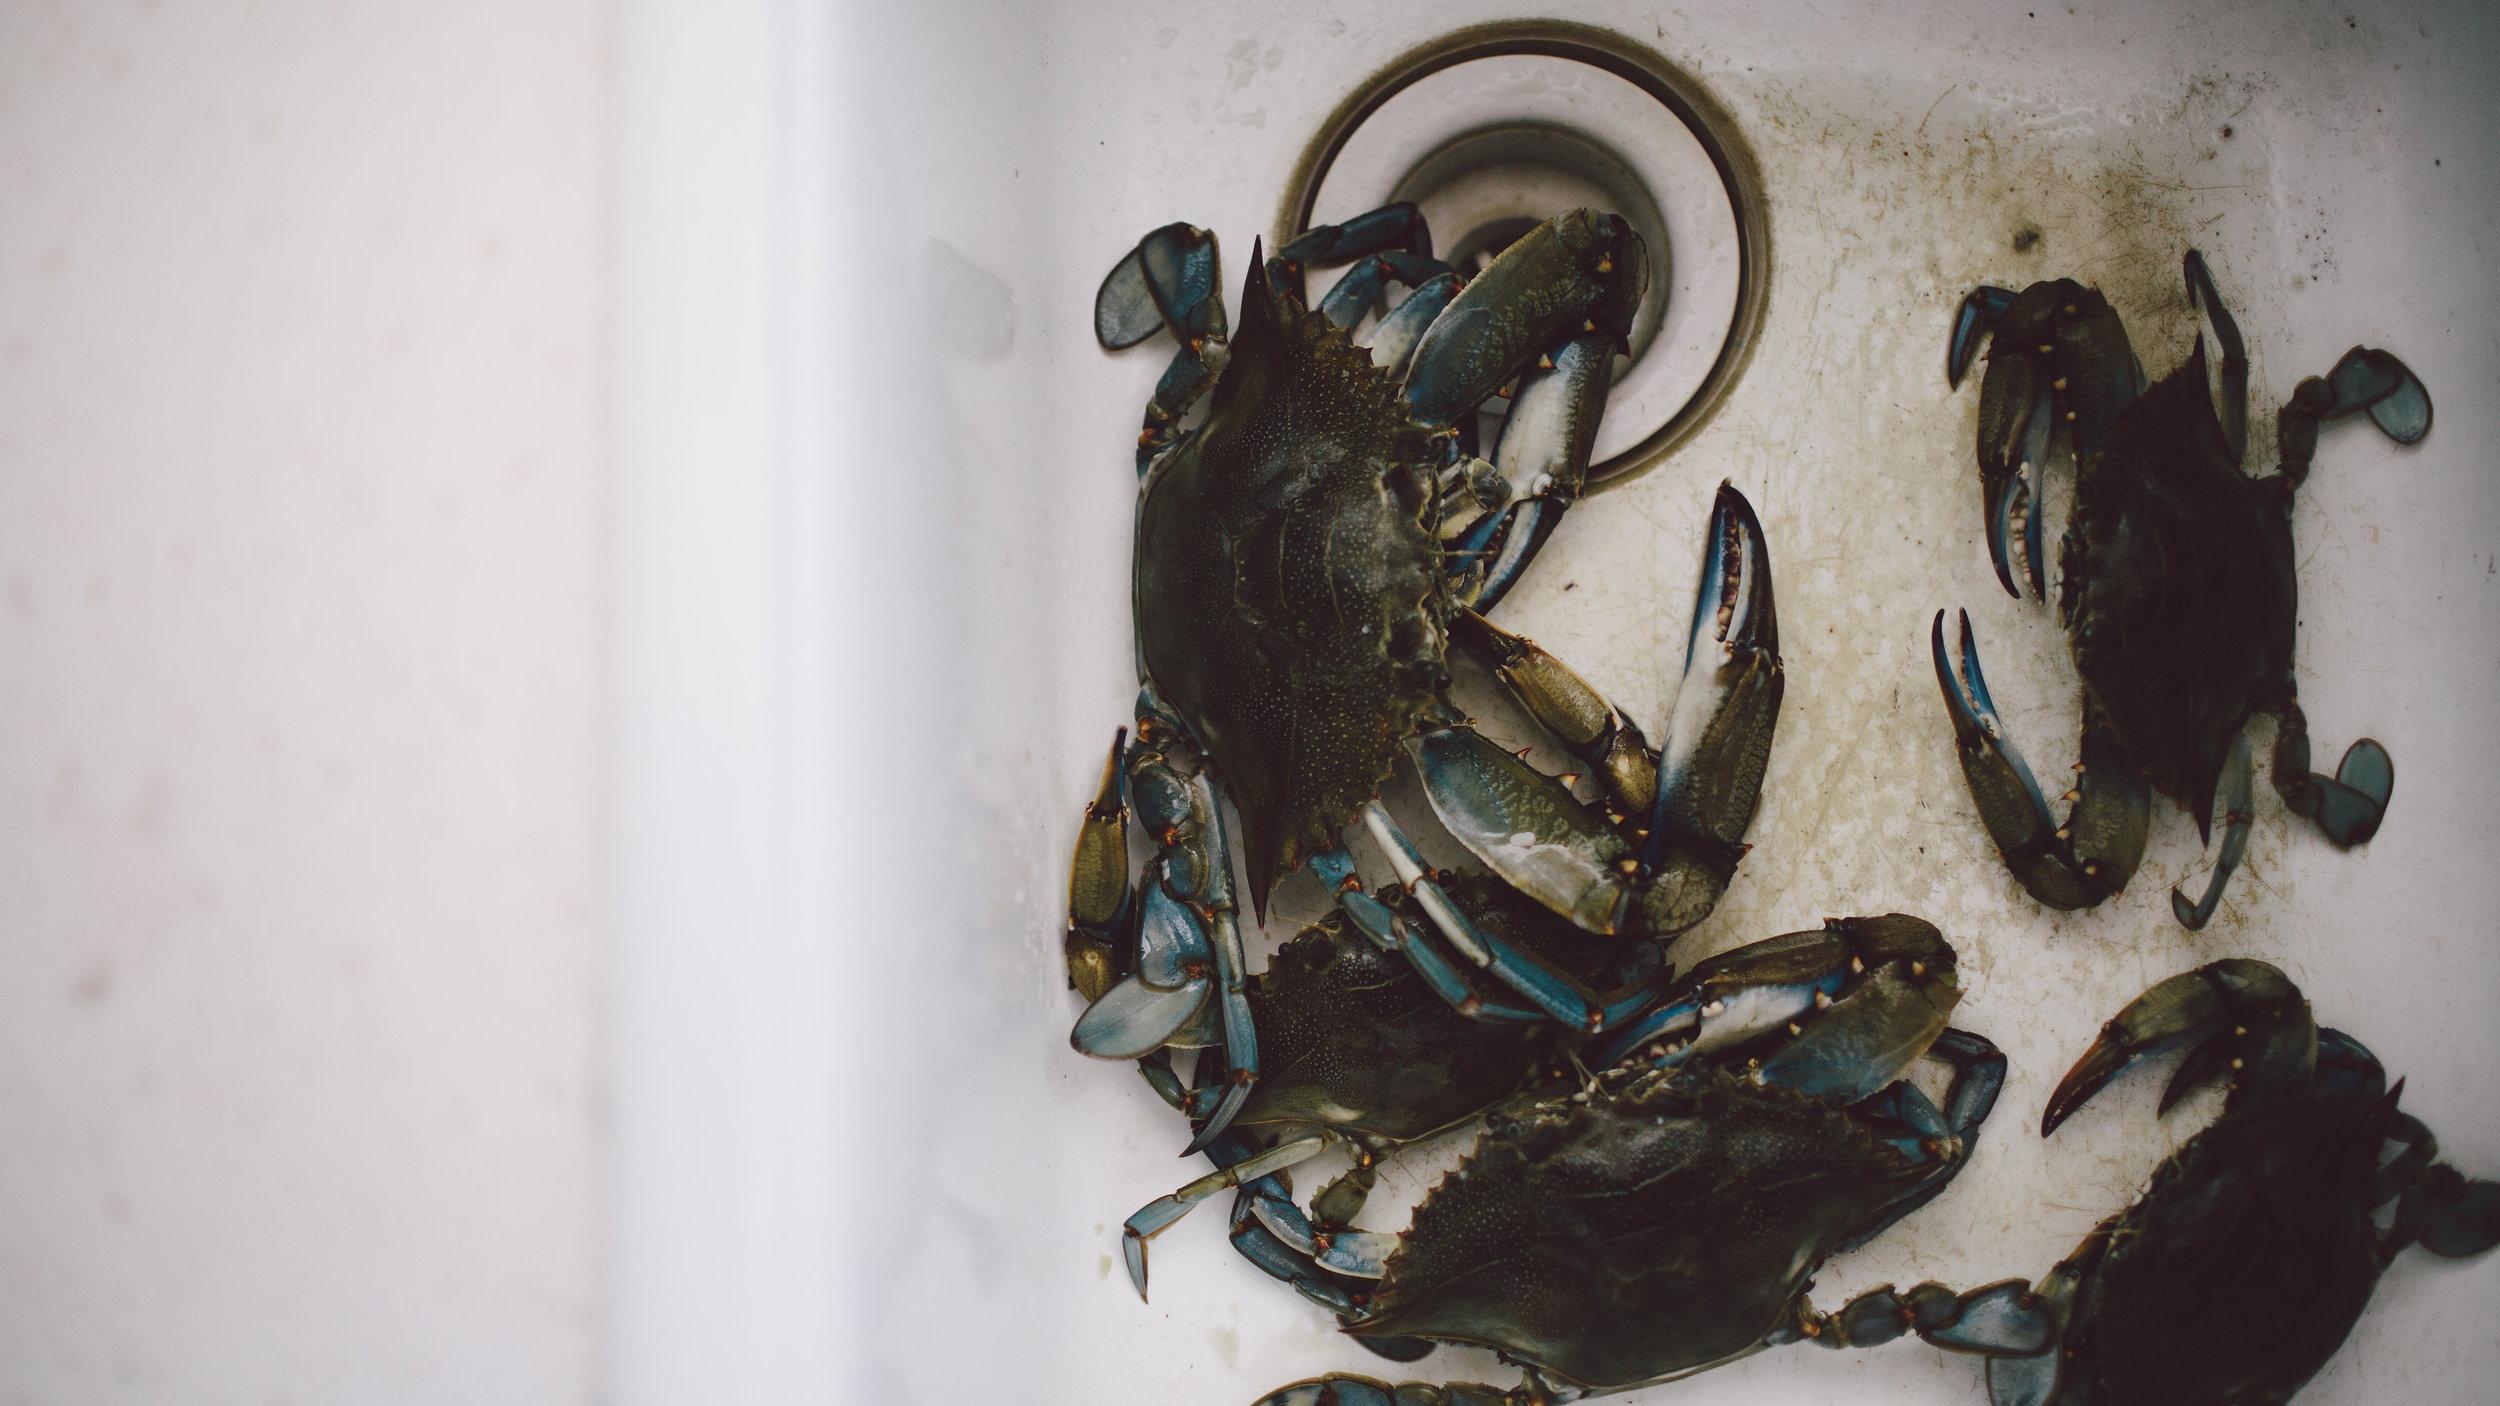 CrabTrap_Day2-14.jpg